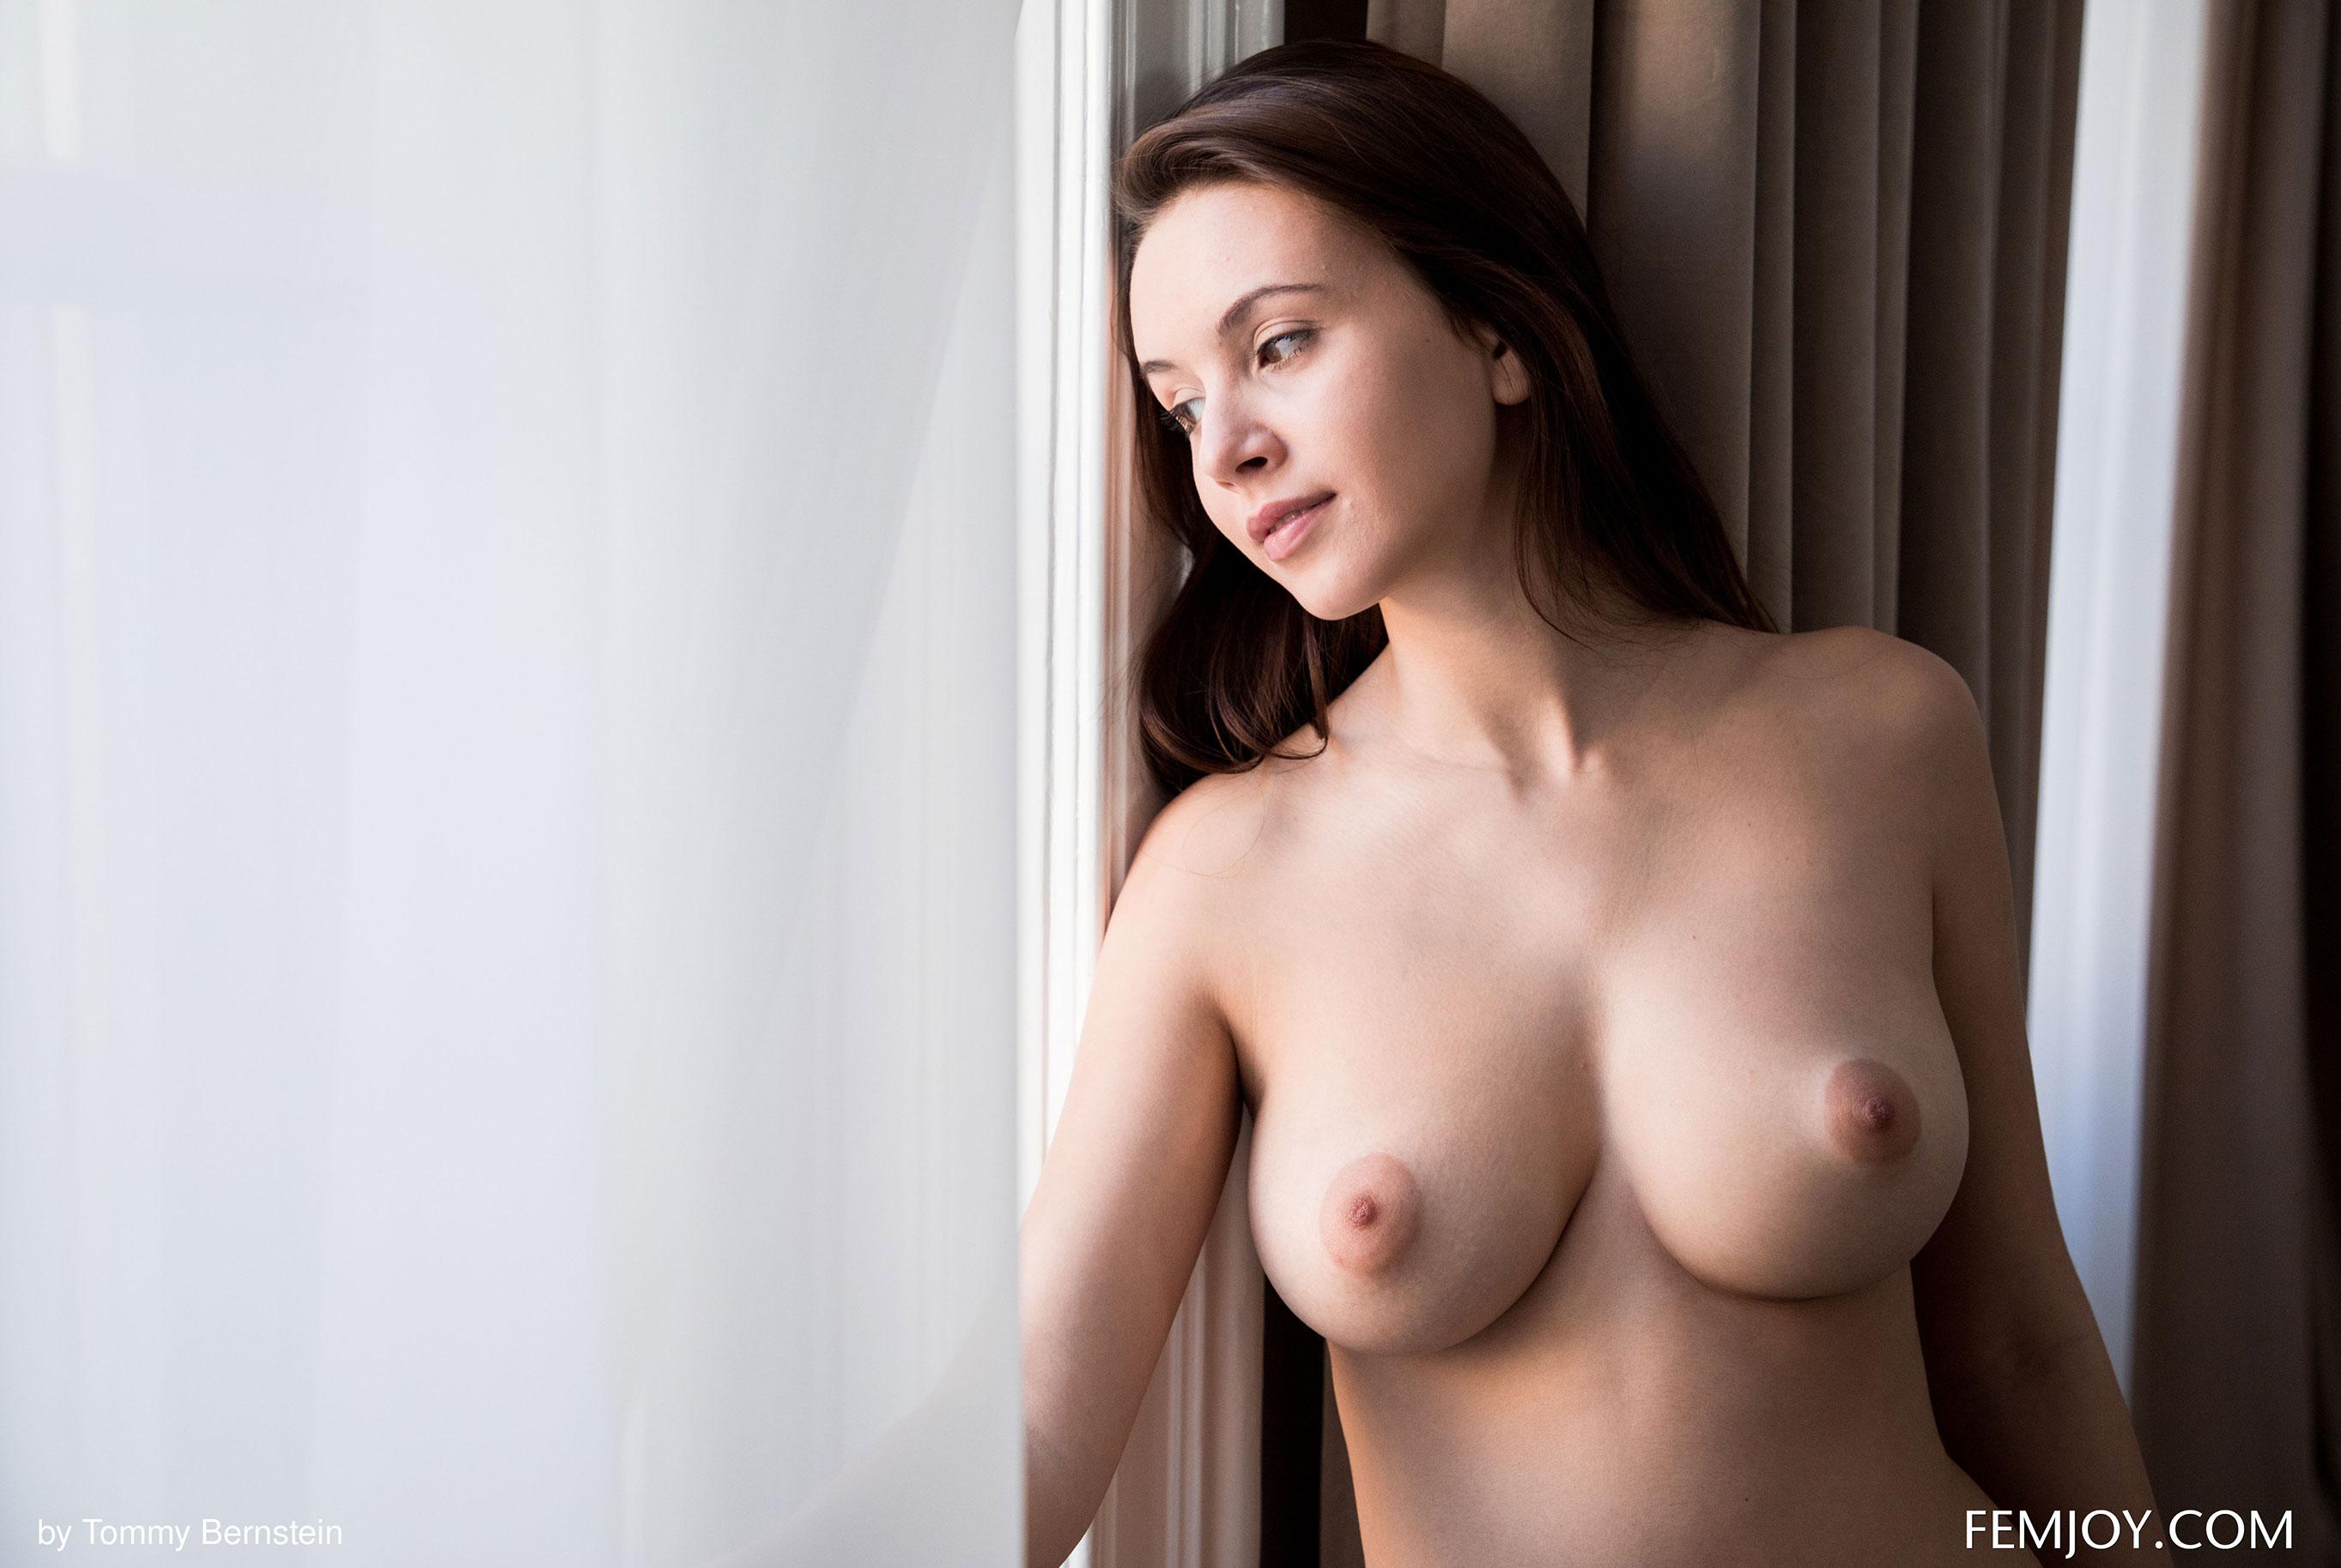 Навстречу новому дню - голая Алиса у окна / фото 02